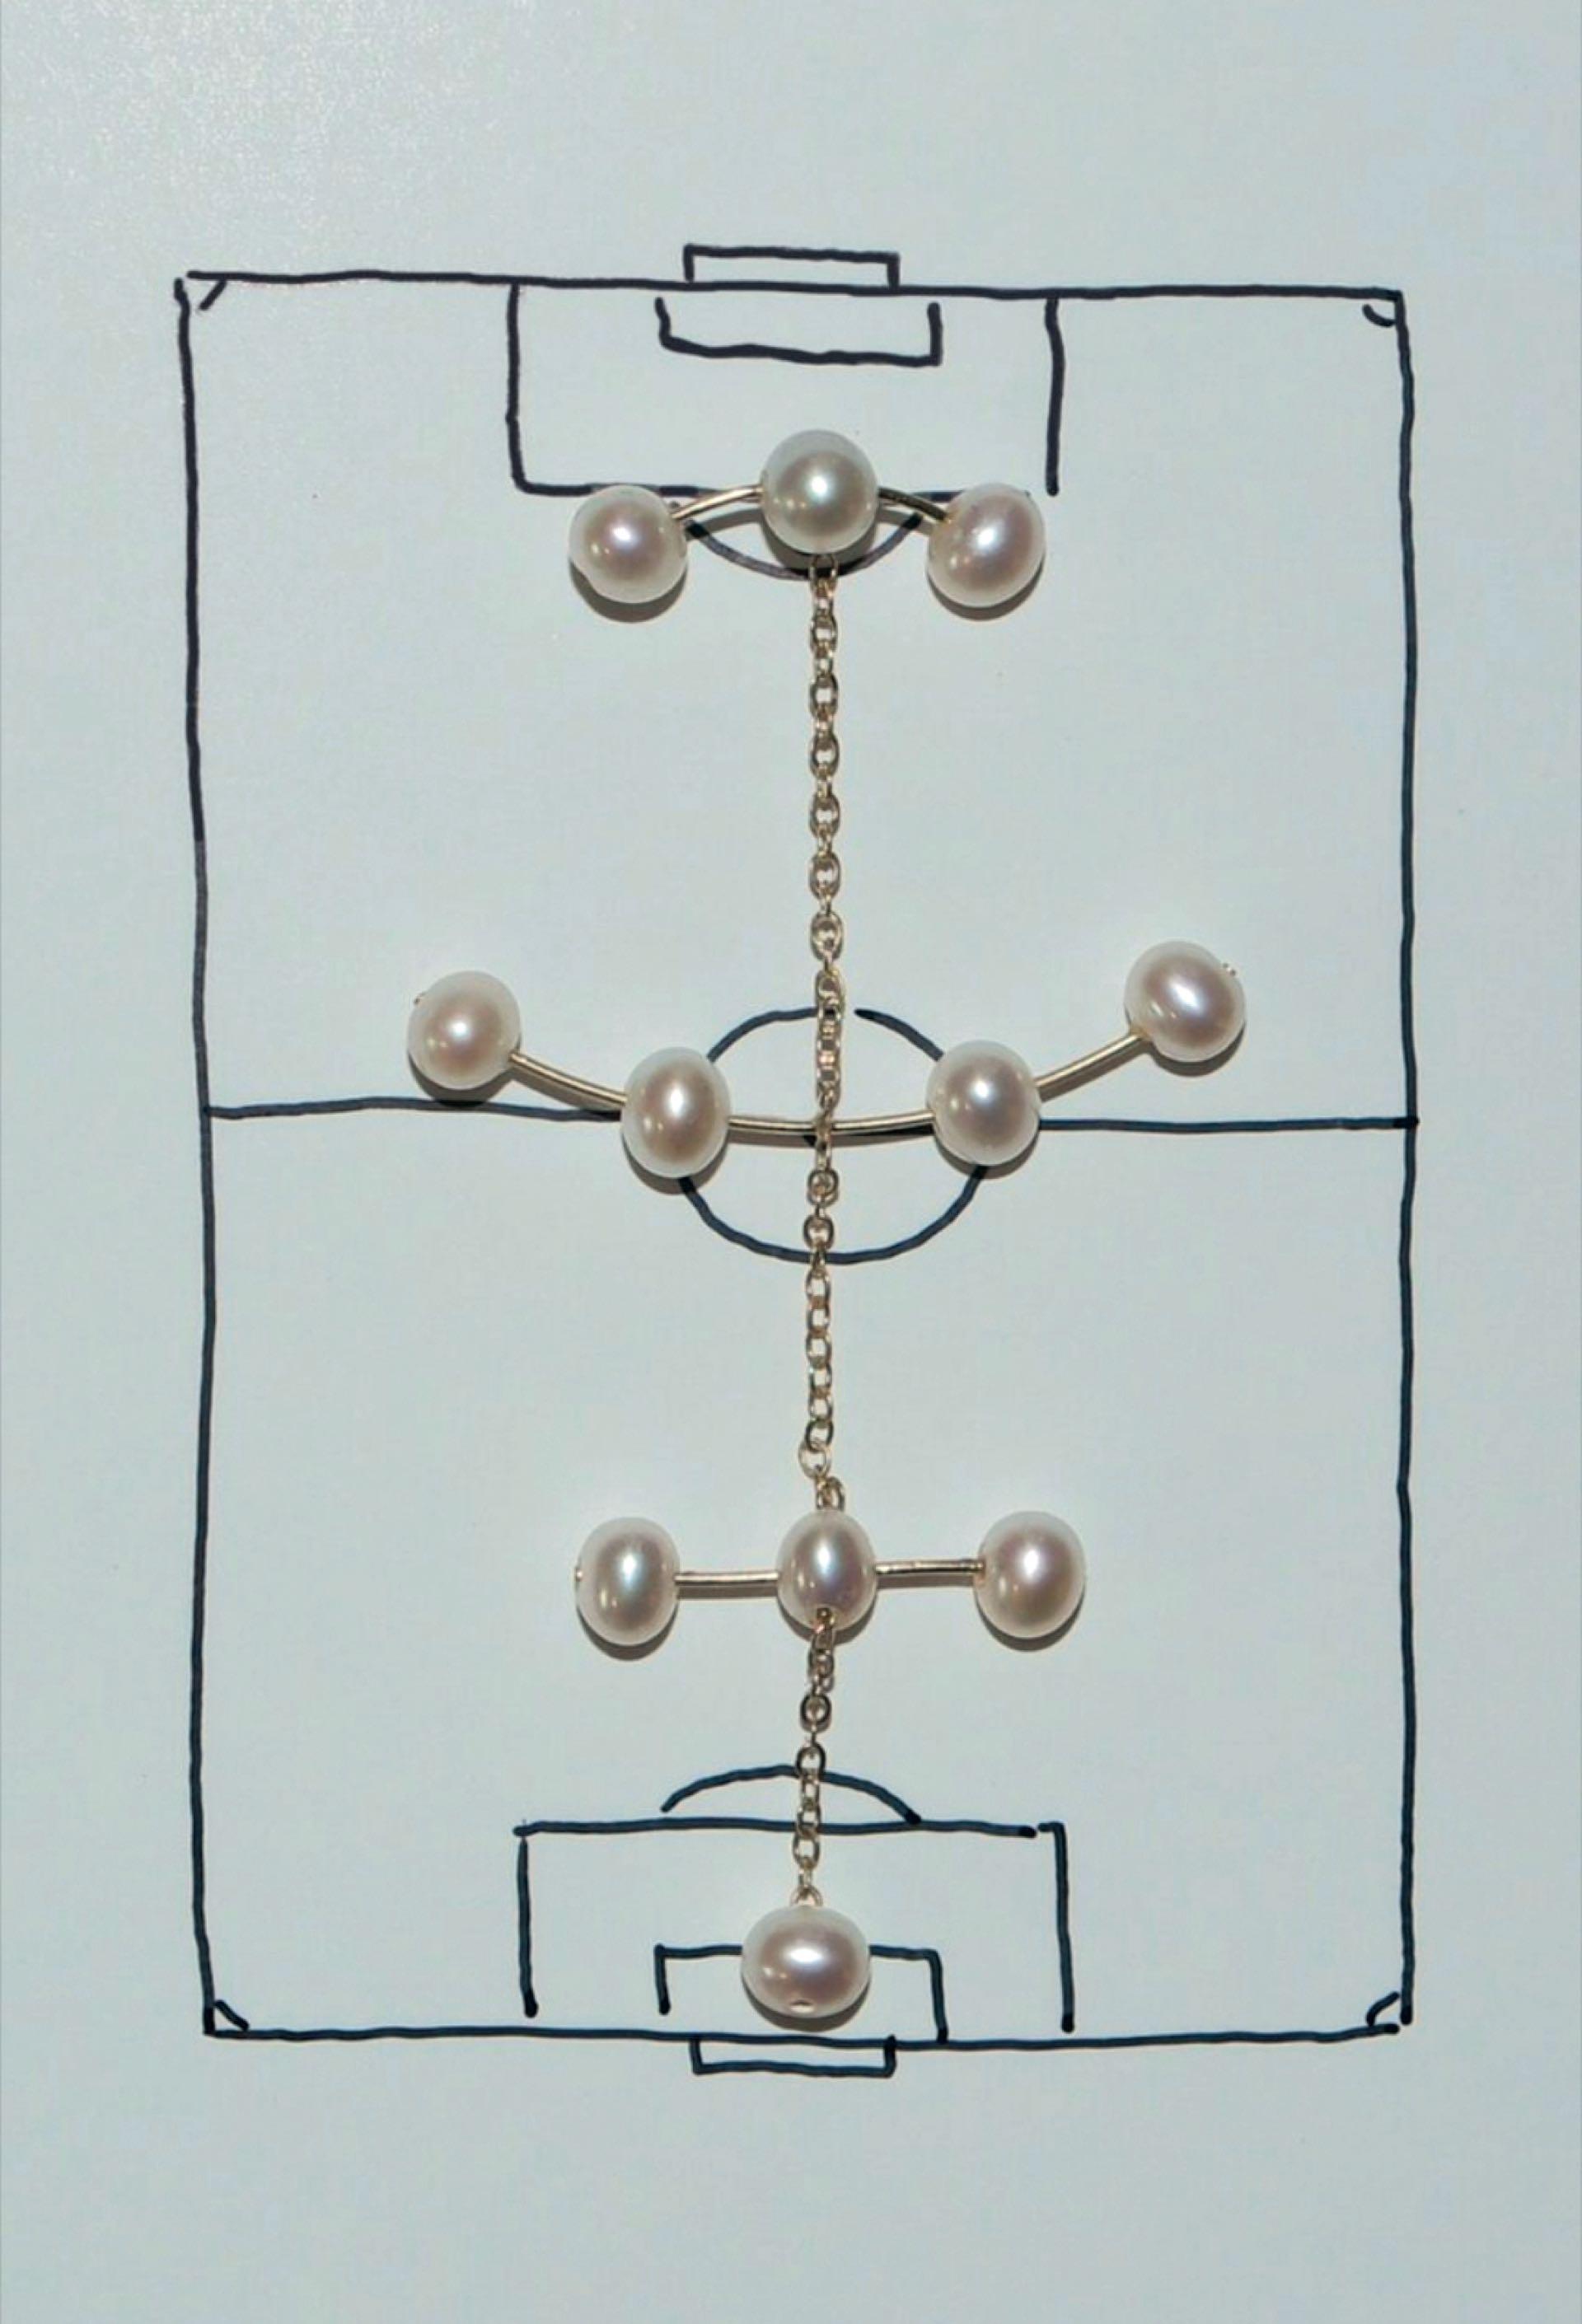 Aros con estrategias futboleras hechas joyería por Saskia Diez.